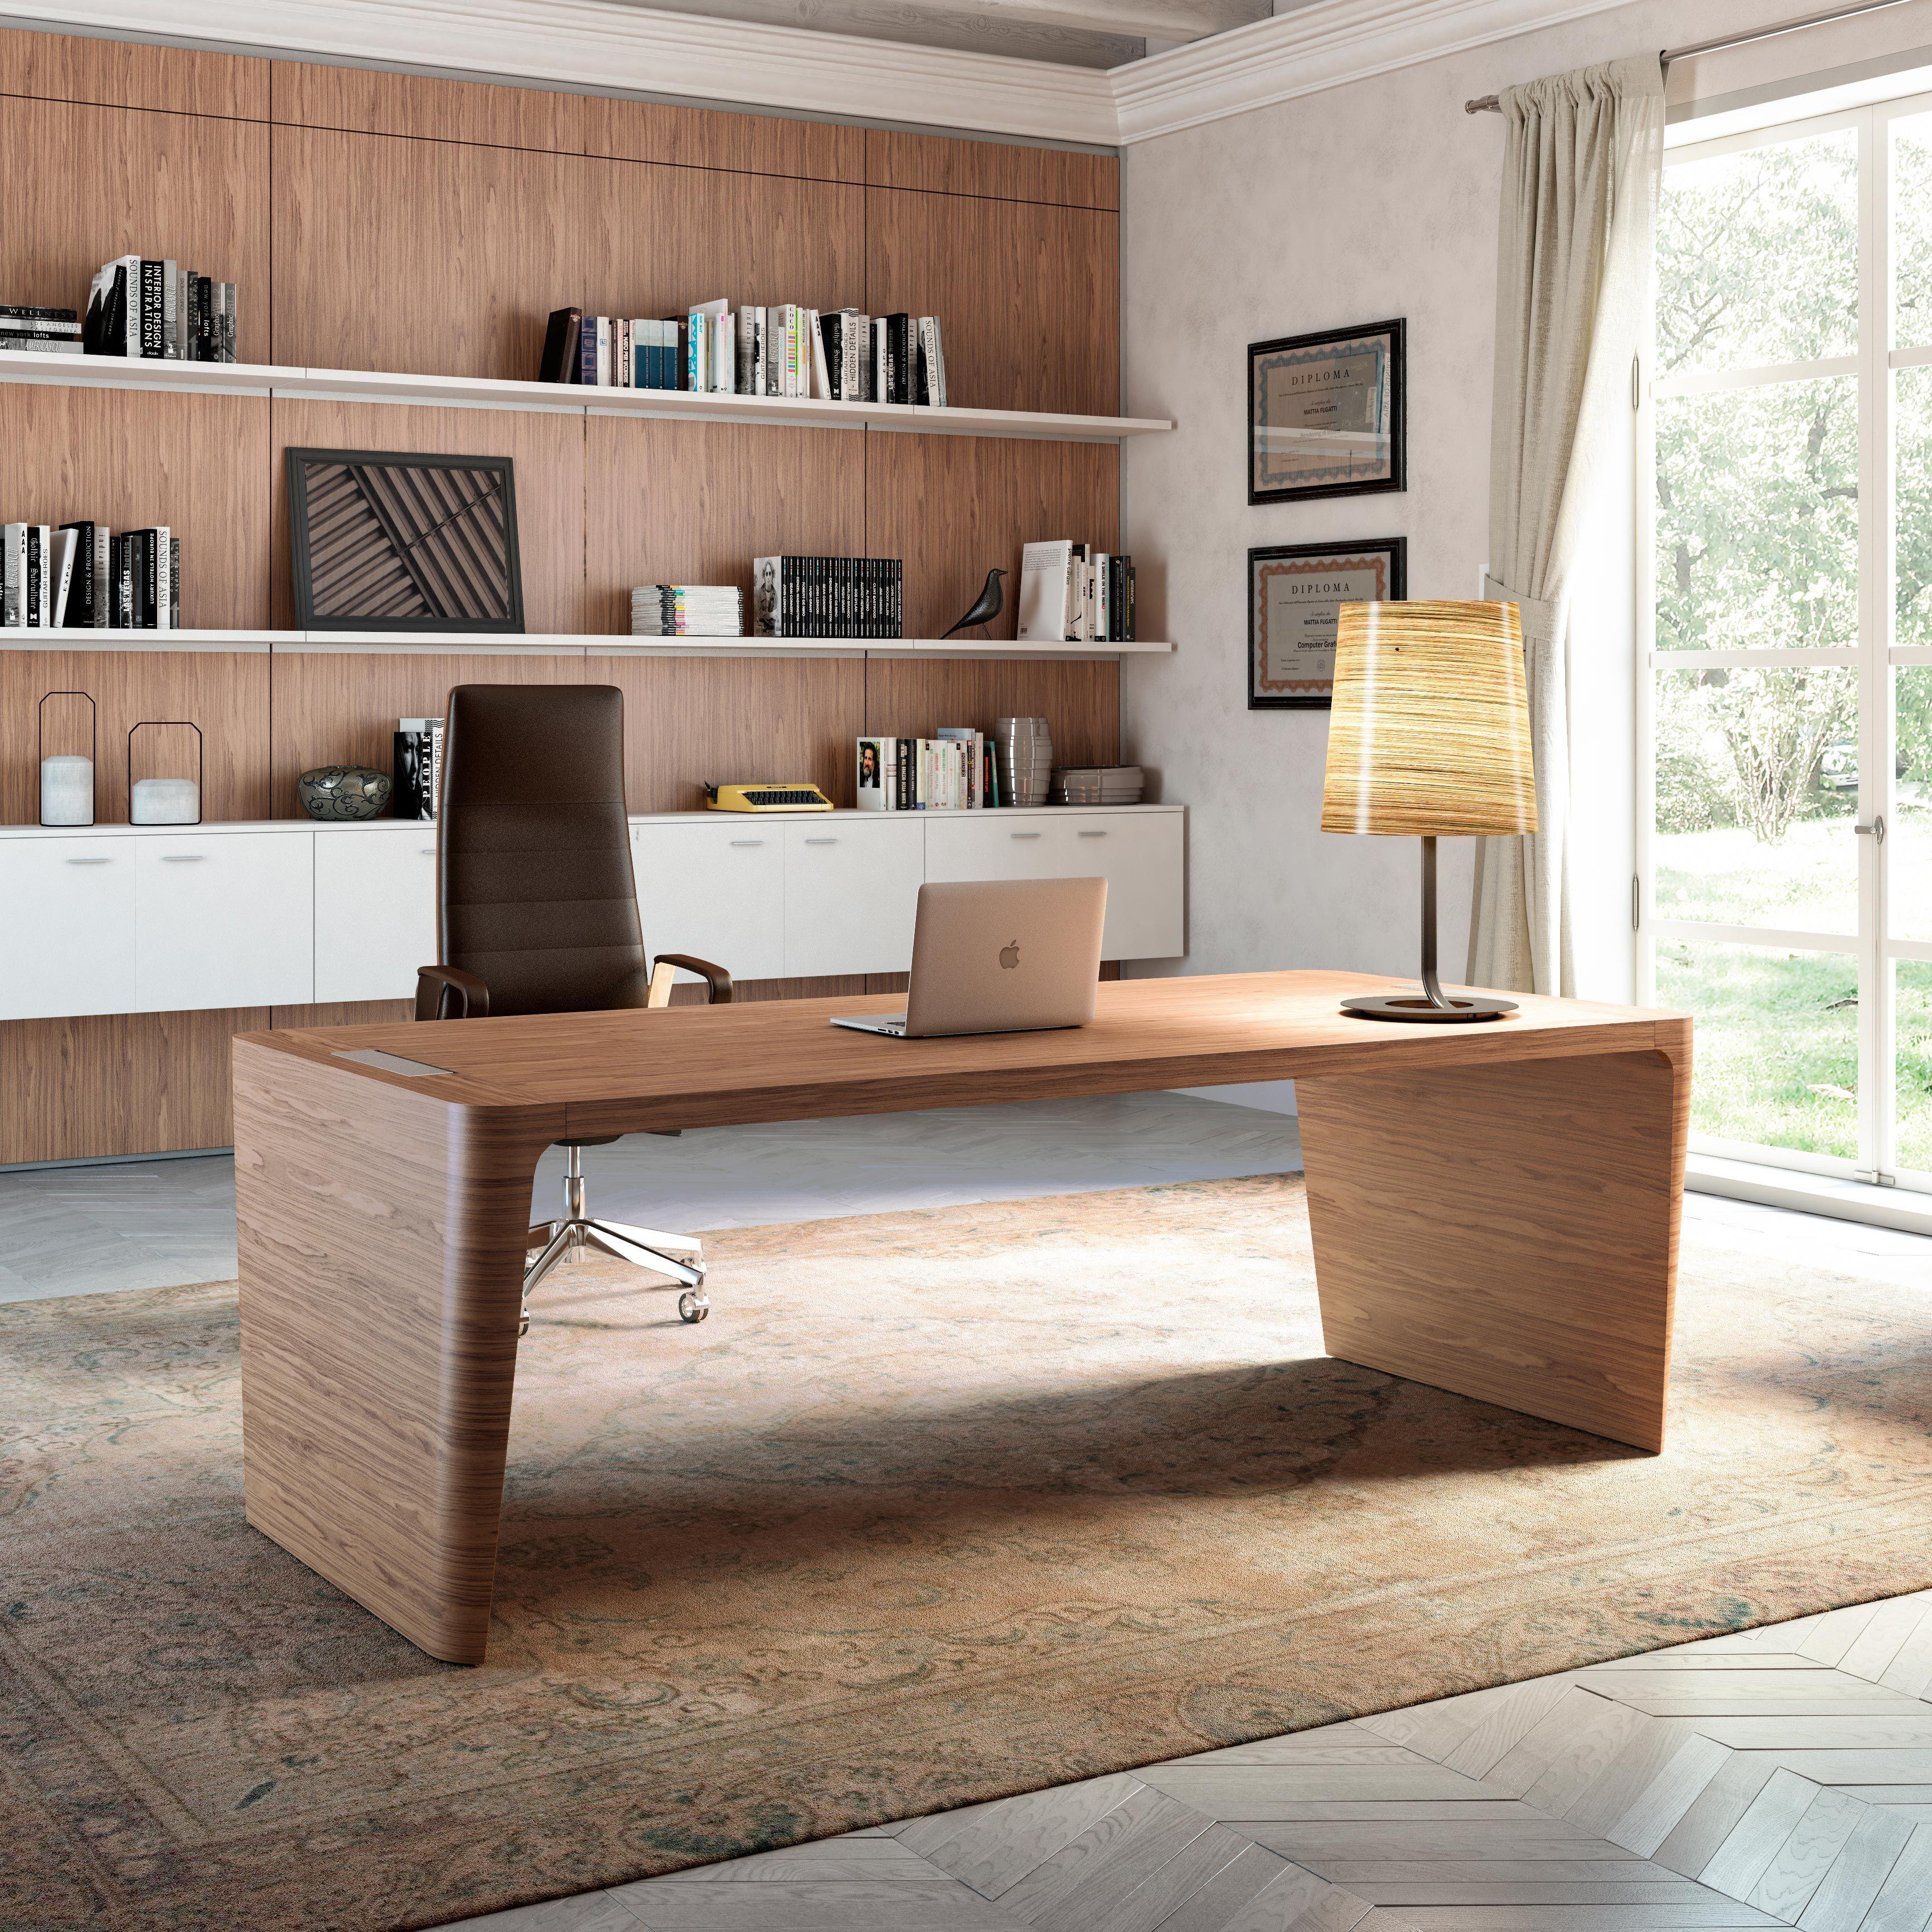 X10 Office Desk Quadrifoglio Italy Executive Office Desk Home Office Design Office Desk